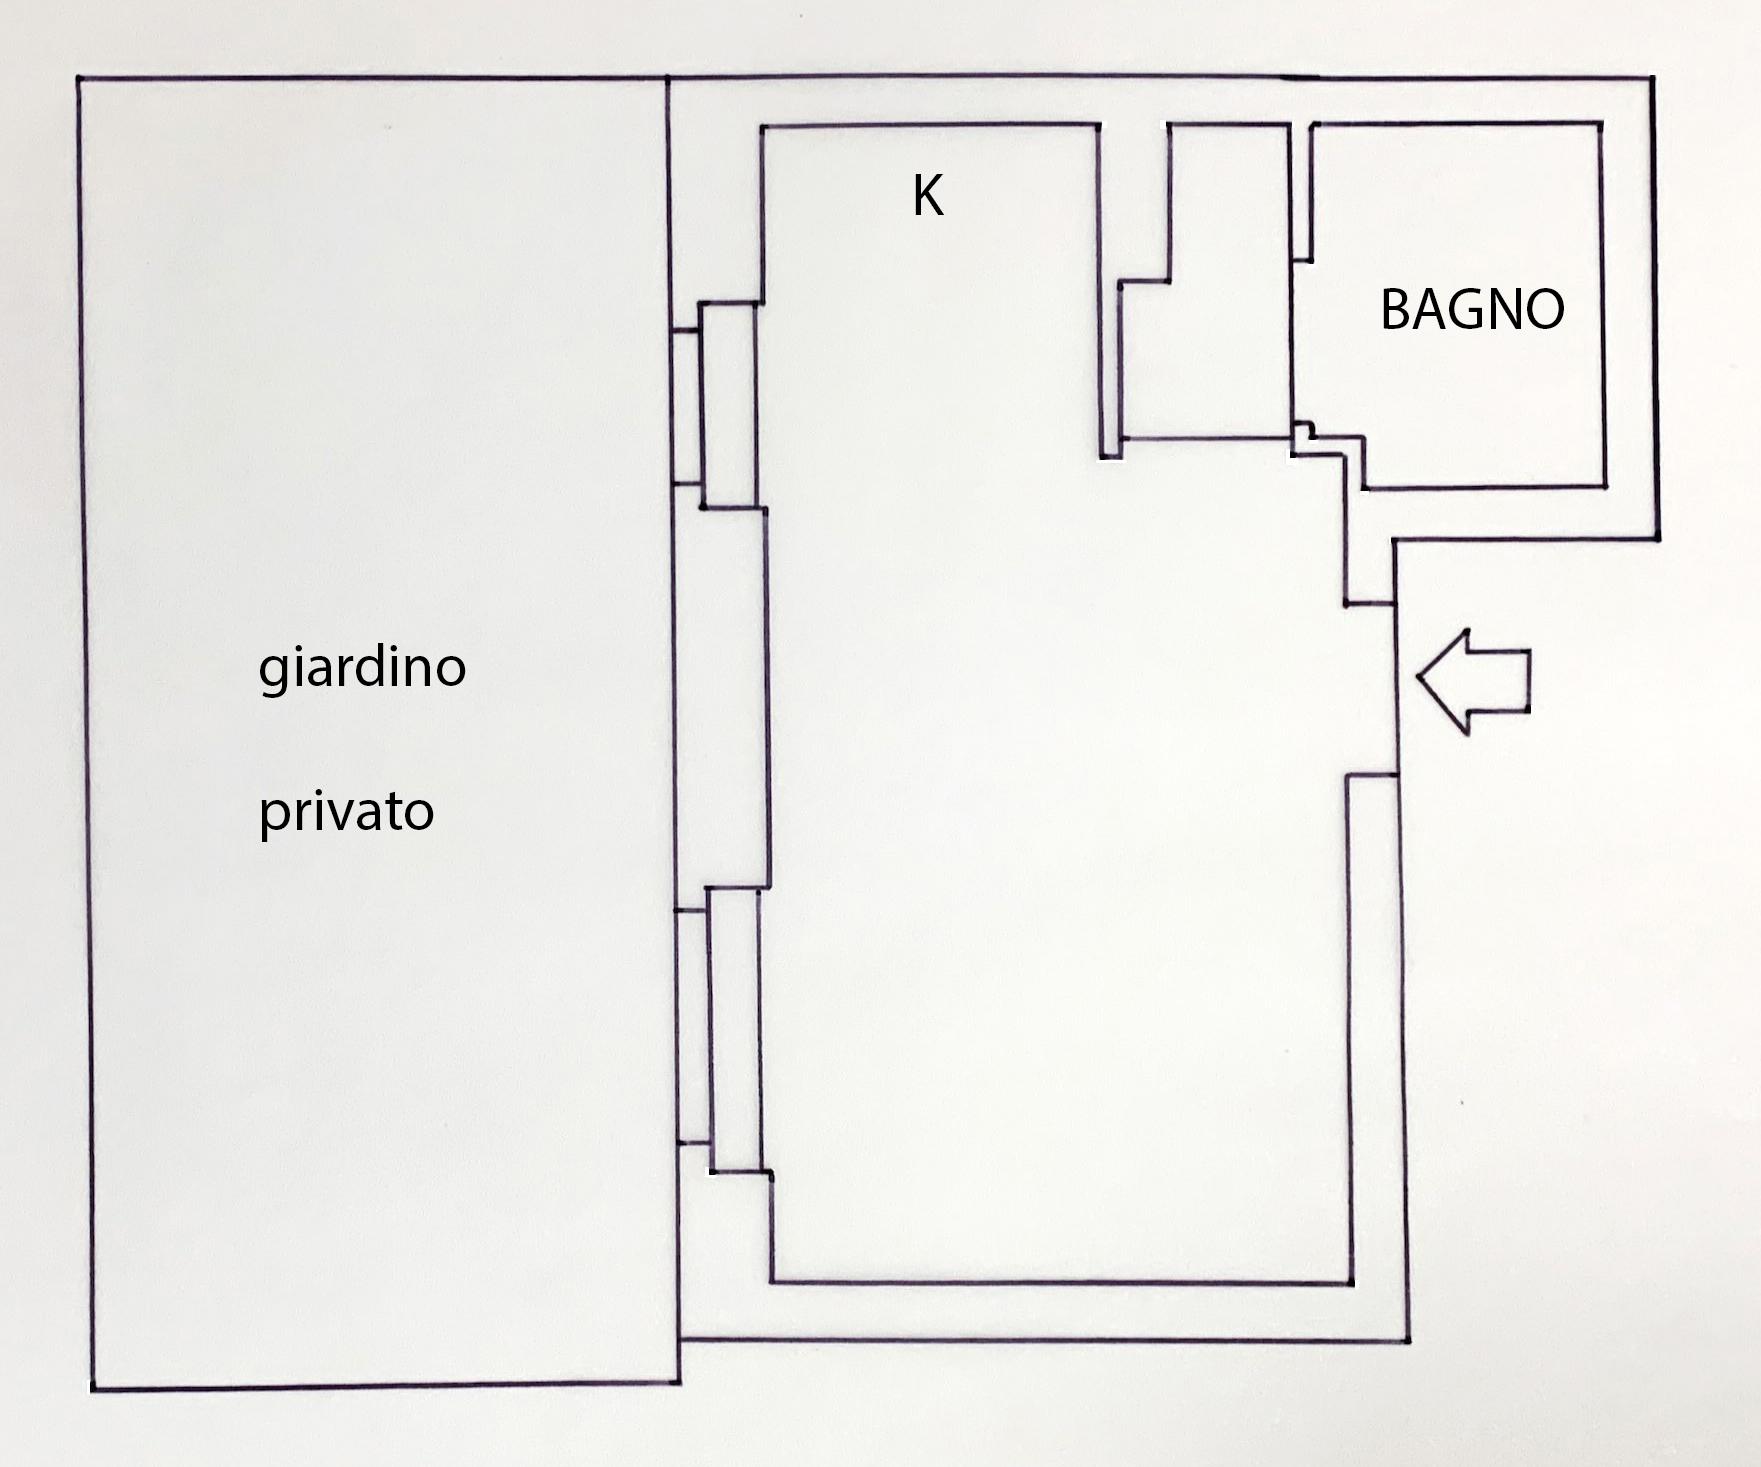 planimetrie/lE7SibvlCS.jpg